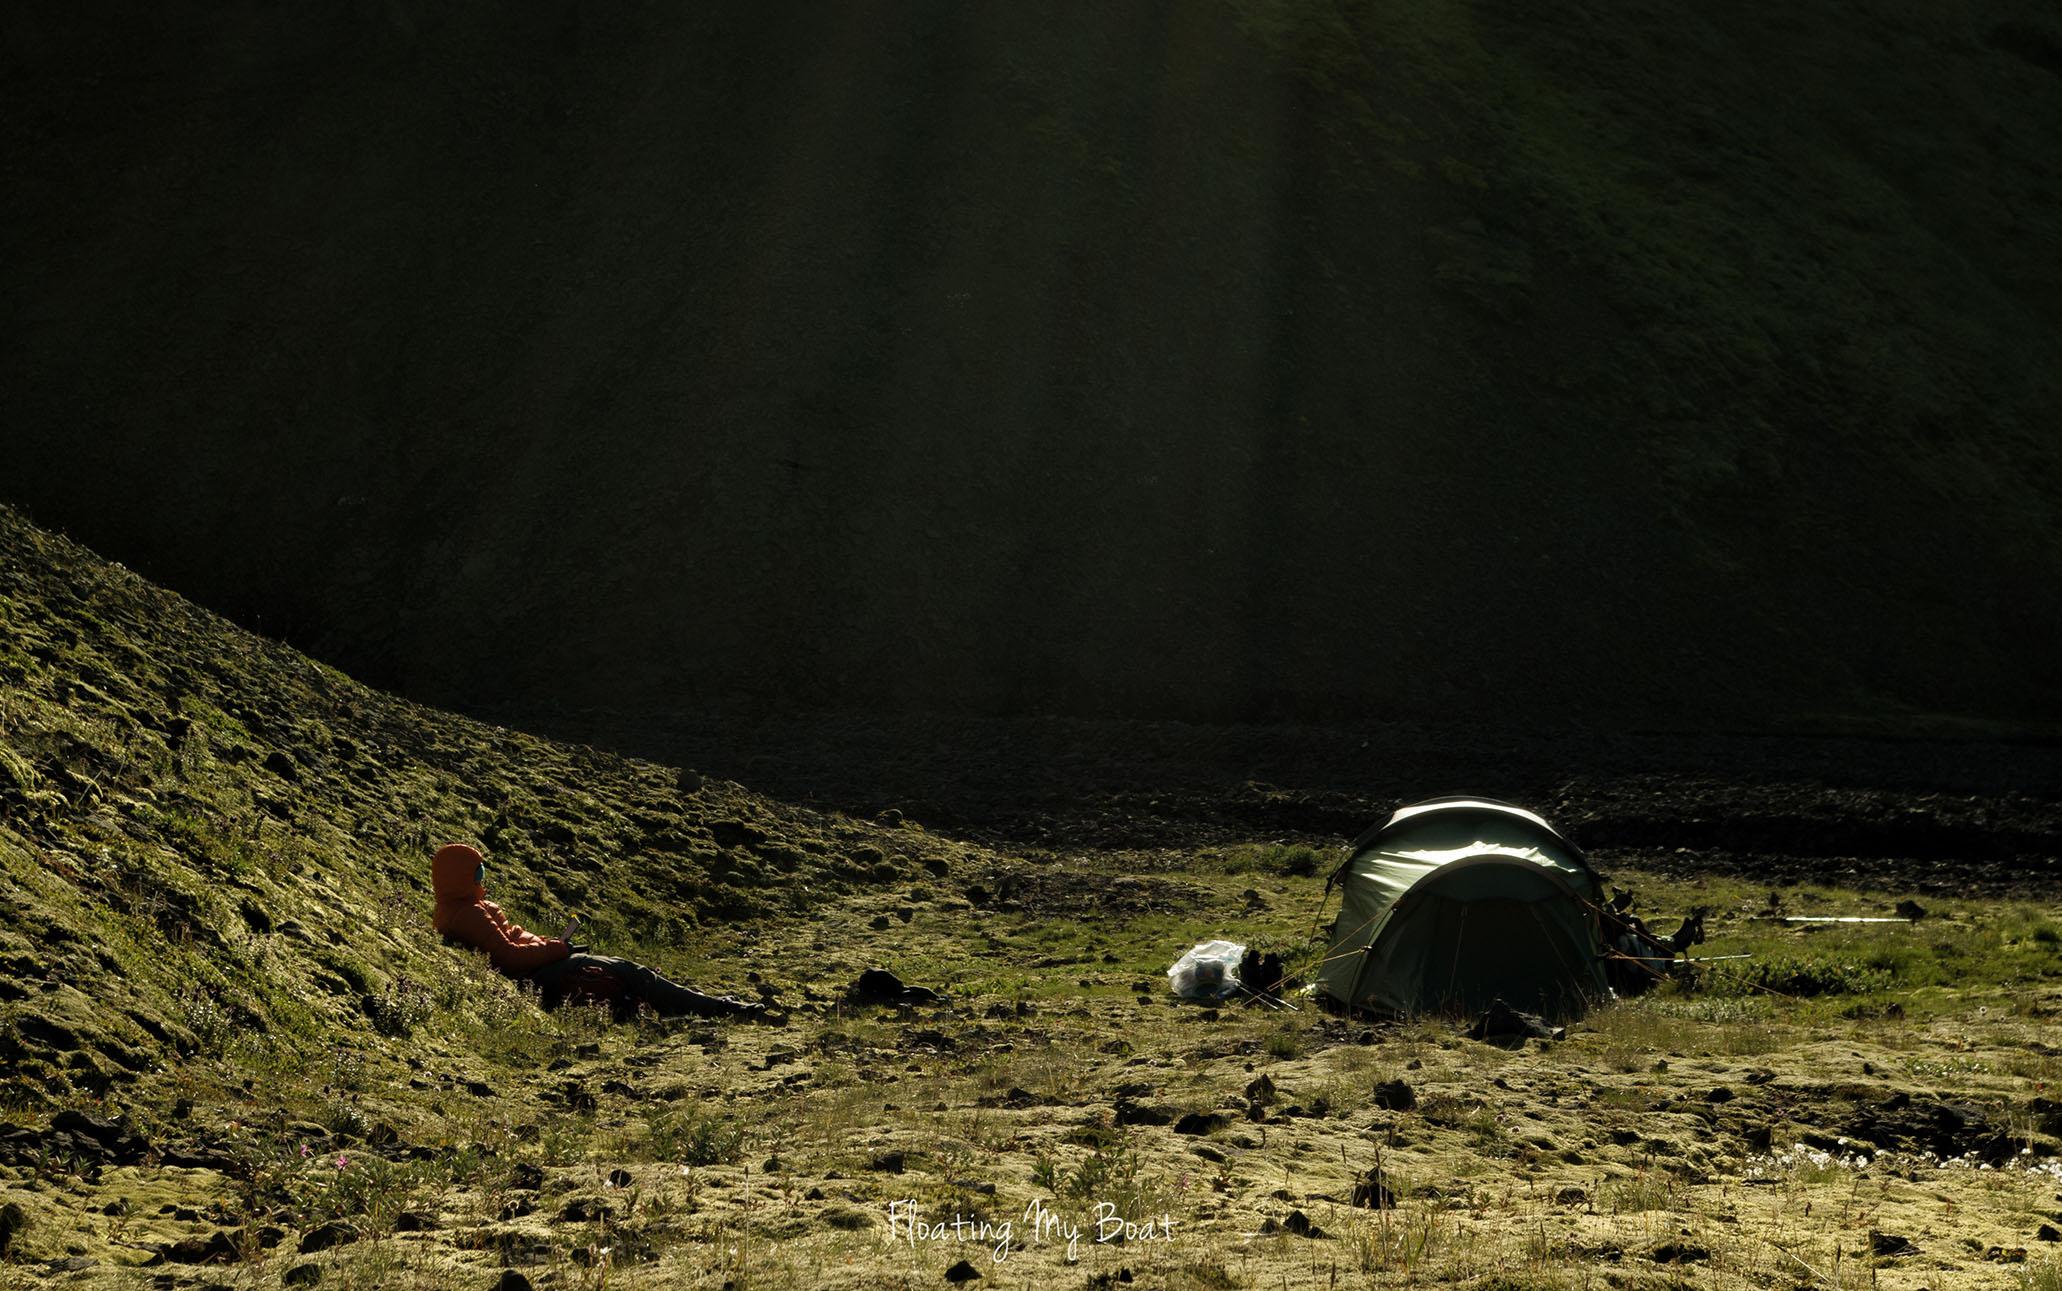 trekking-vatnajokull-iceland-28